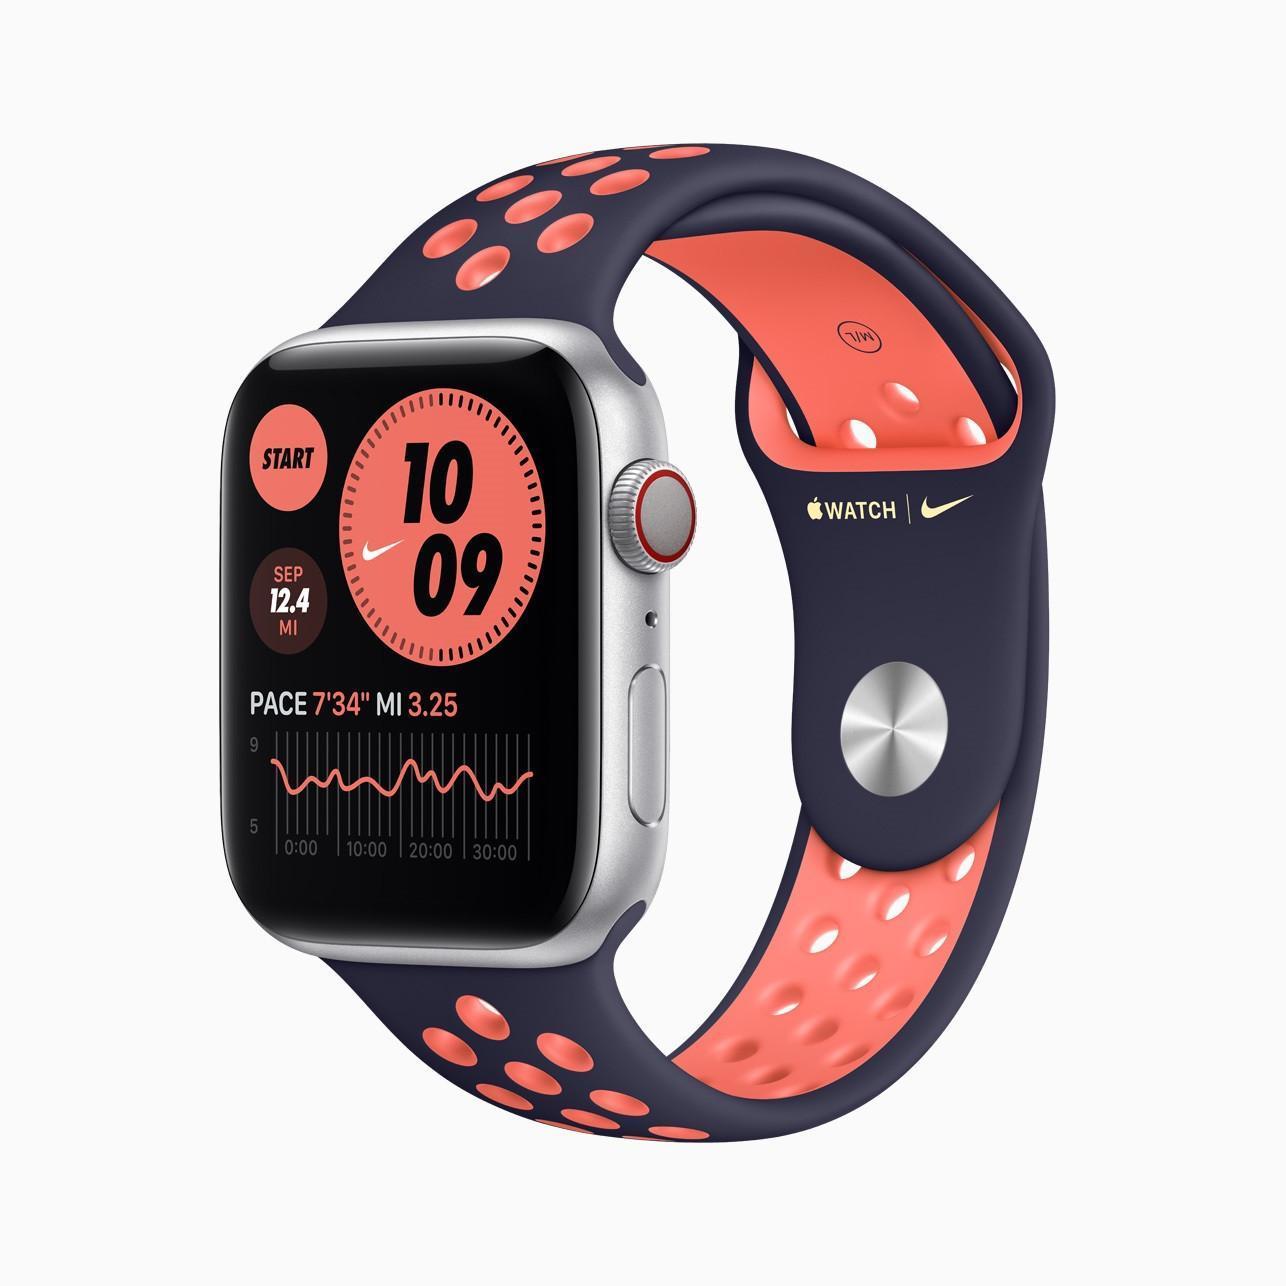 Apple Watch 6对比荣耀手表GS Pro,选谁?